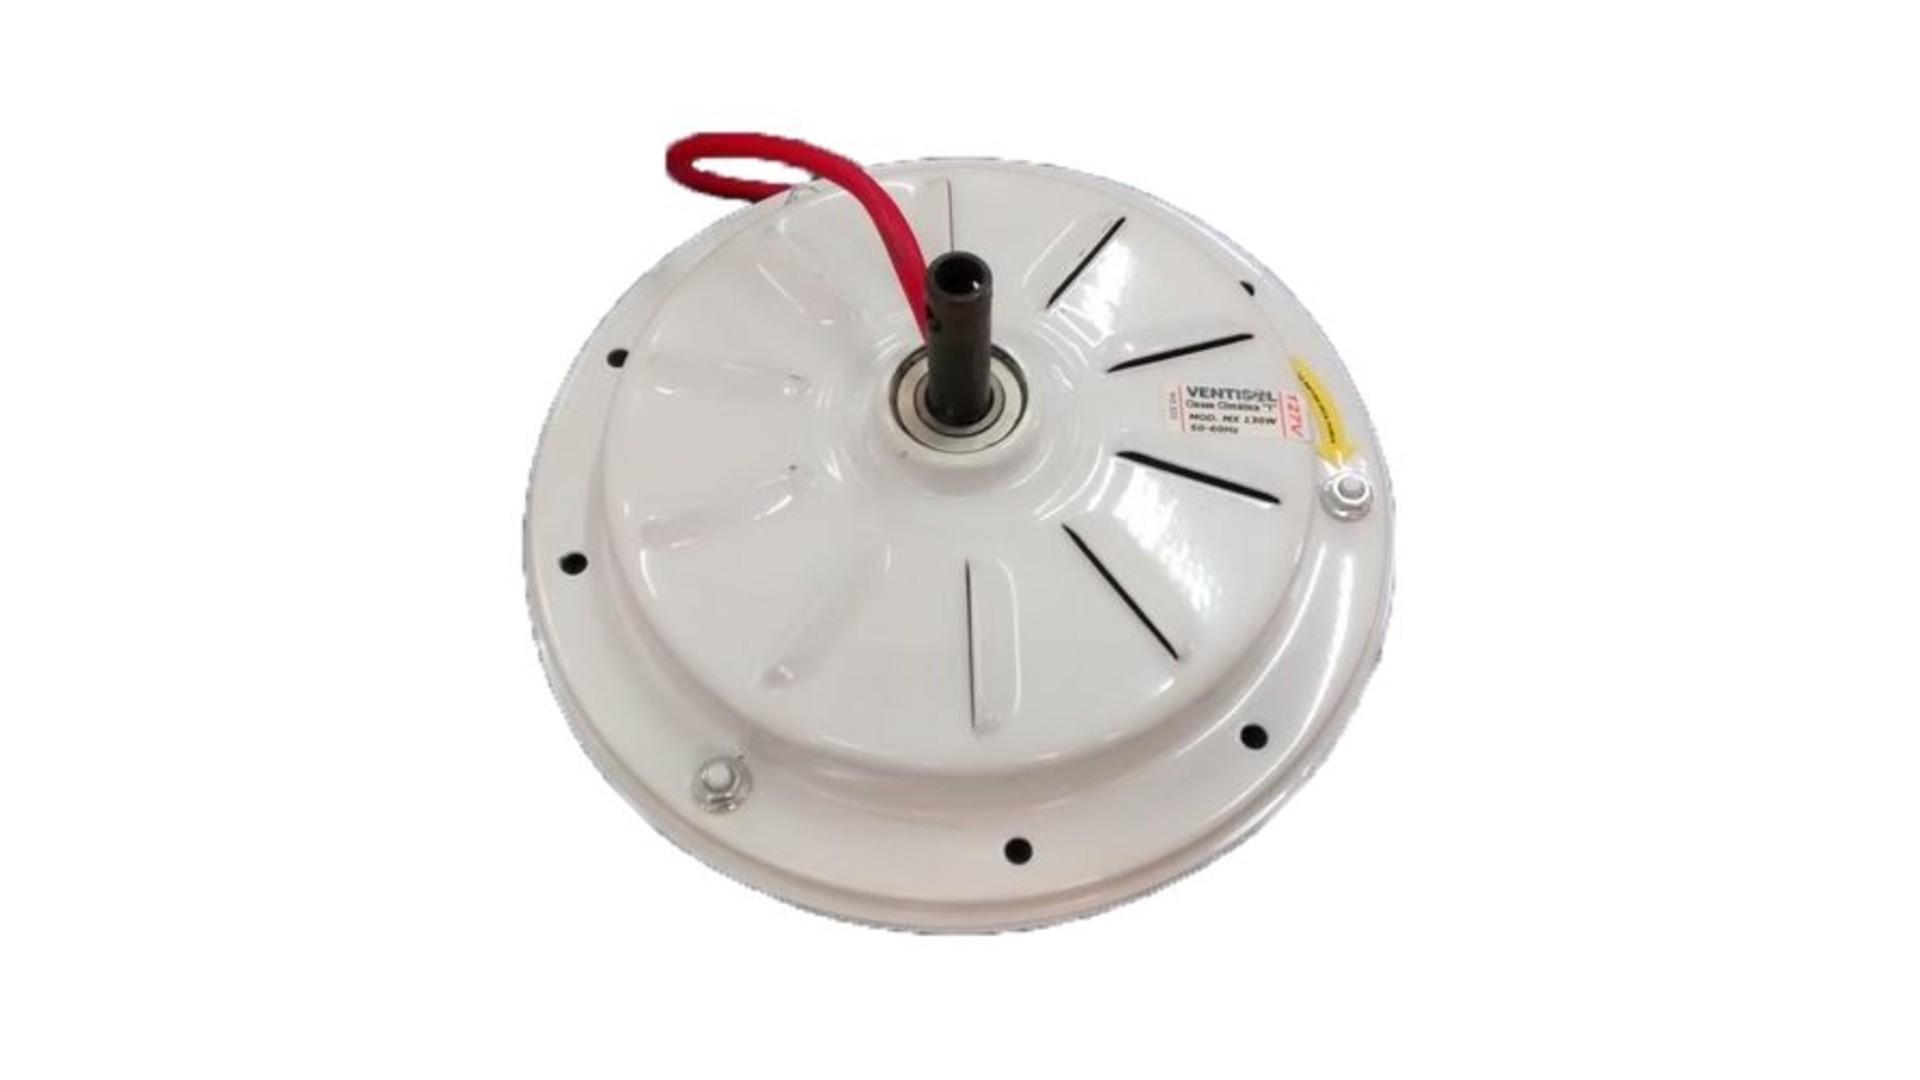 Motor Ventilador De Teto Ventisol 220v Branco